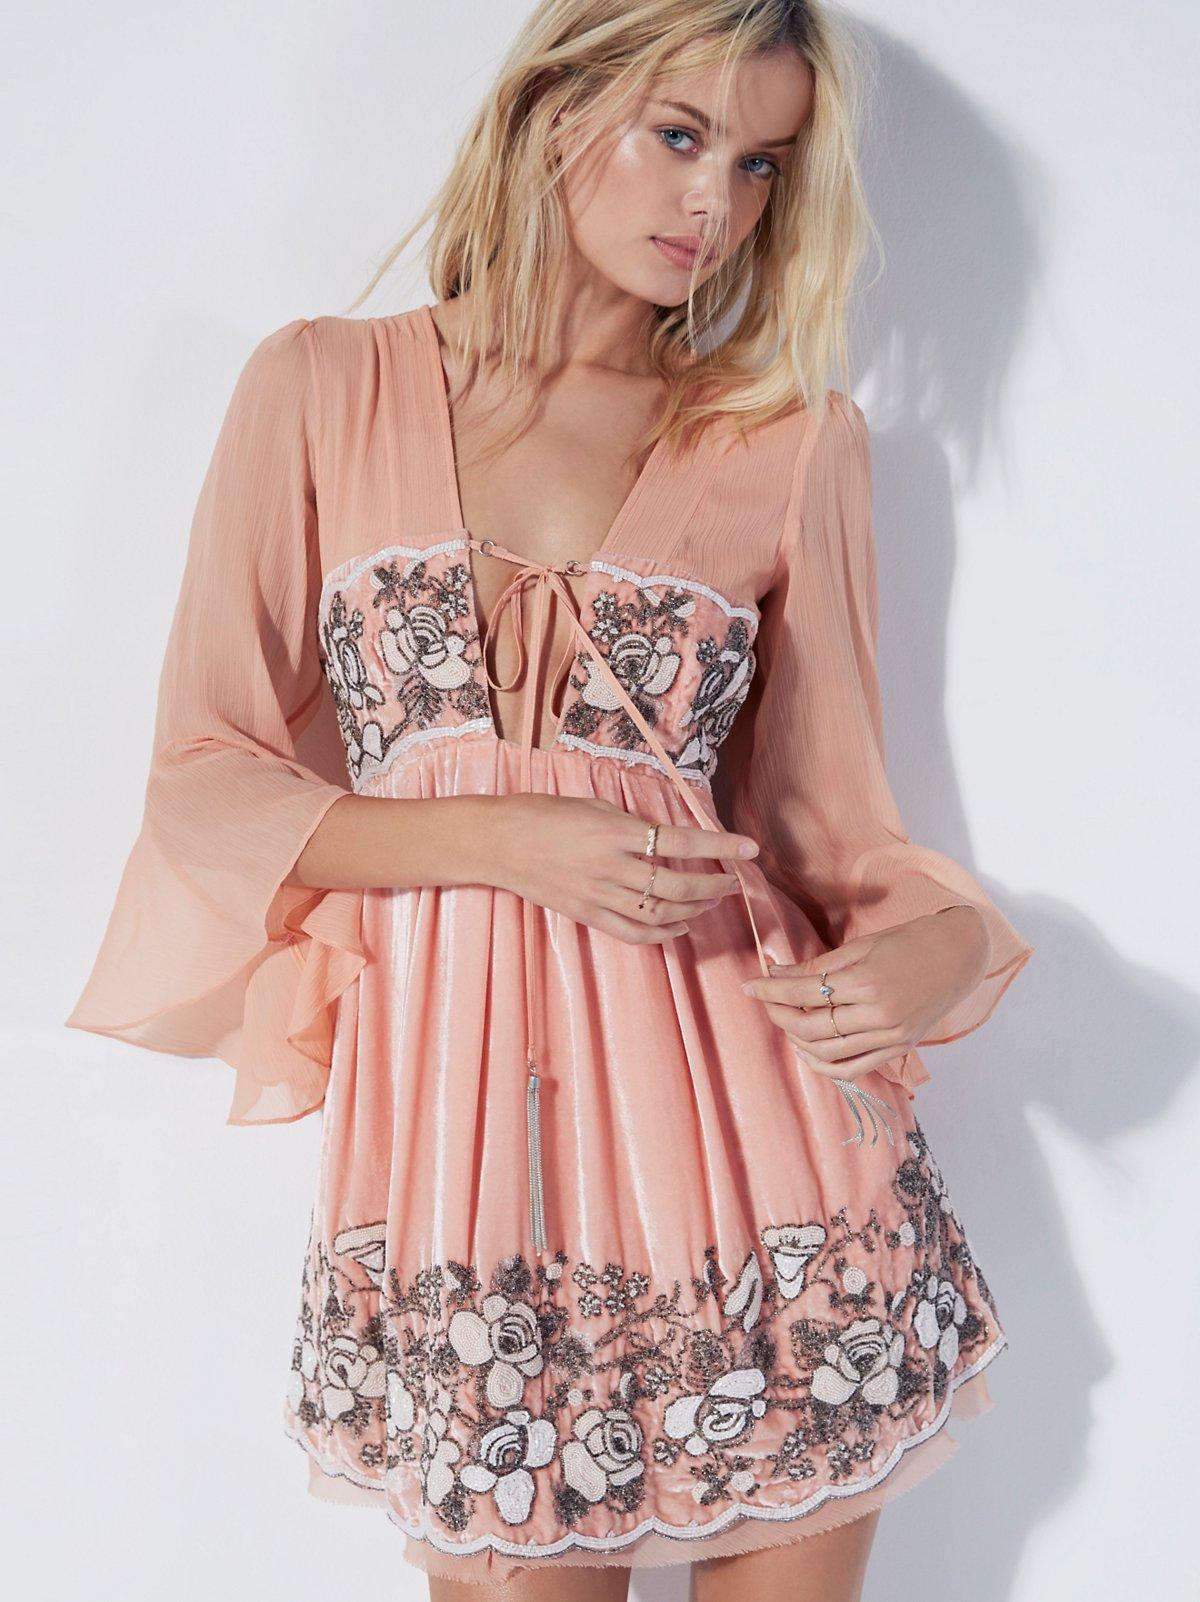 Gemma's Limited Edition Holiday Dress